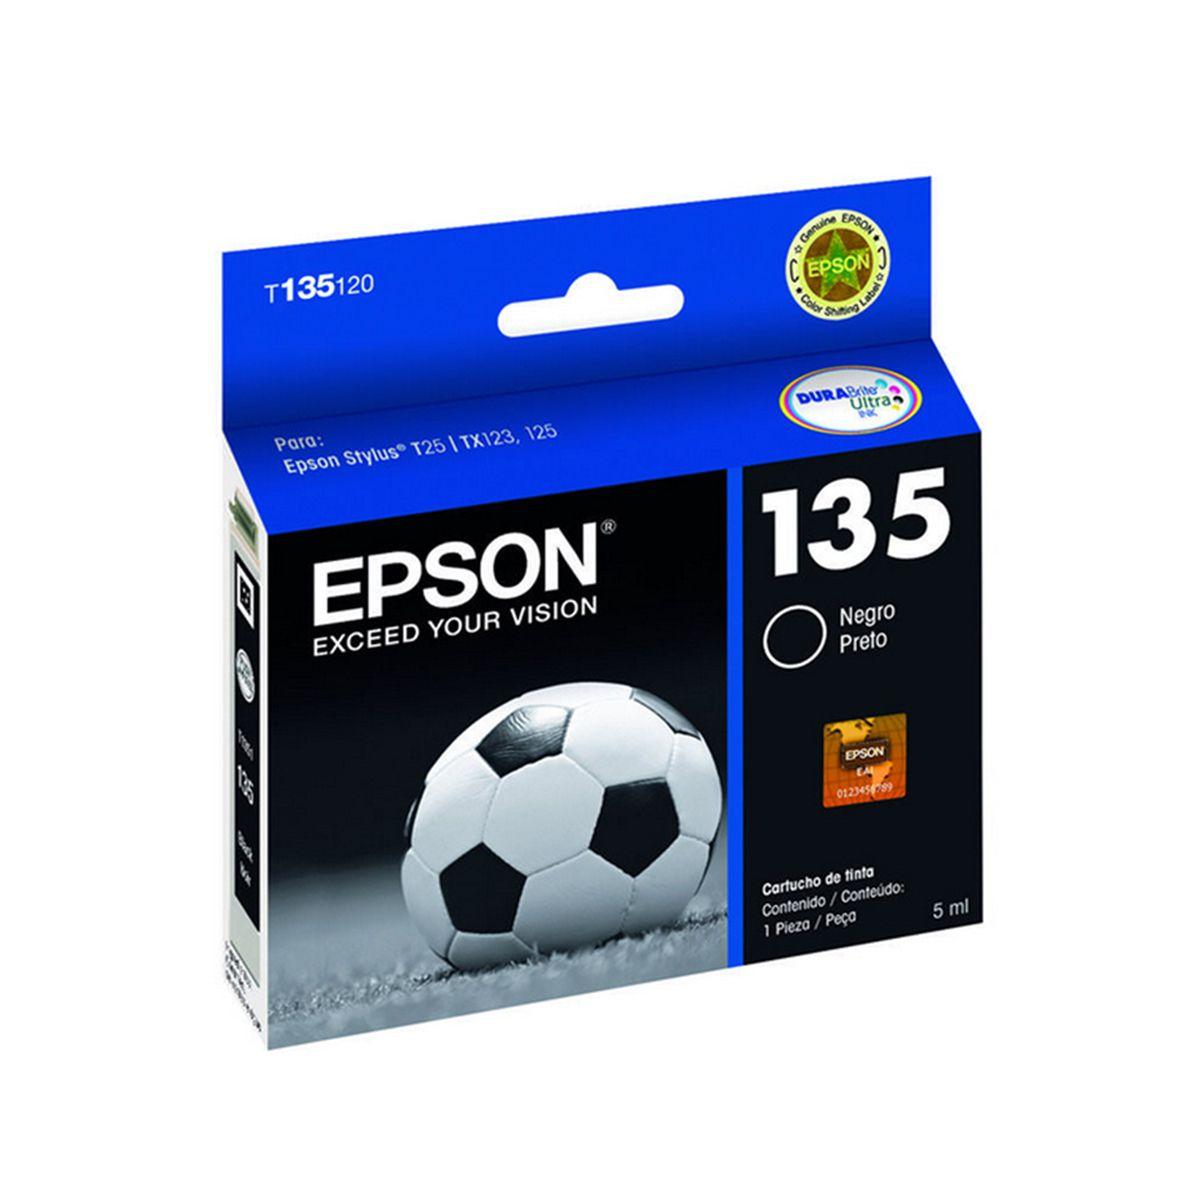 Cartucho Epson T135120 T135 135 para Stylus T25 TX123 TX125 TX133 TX135 Preto